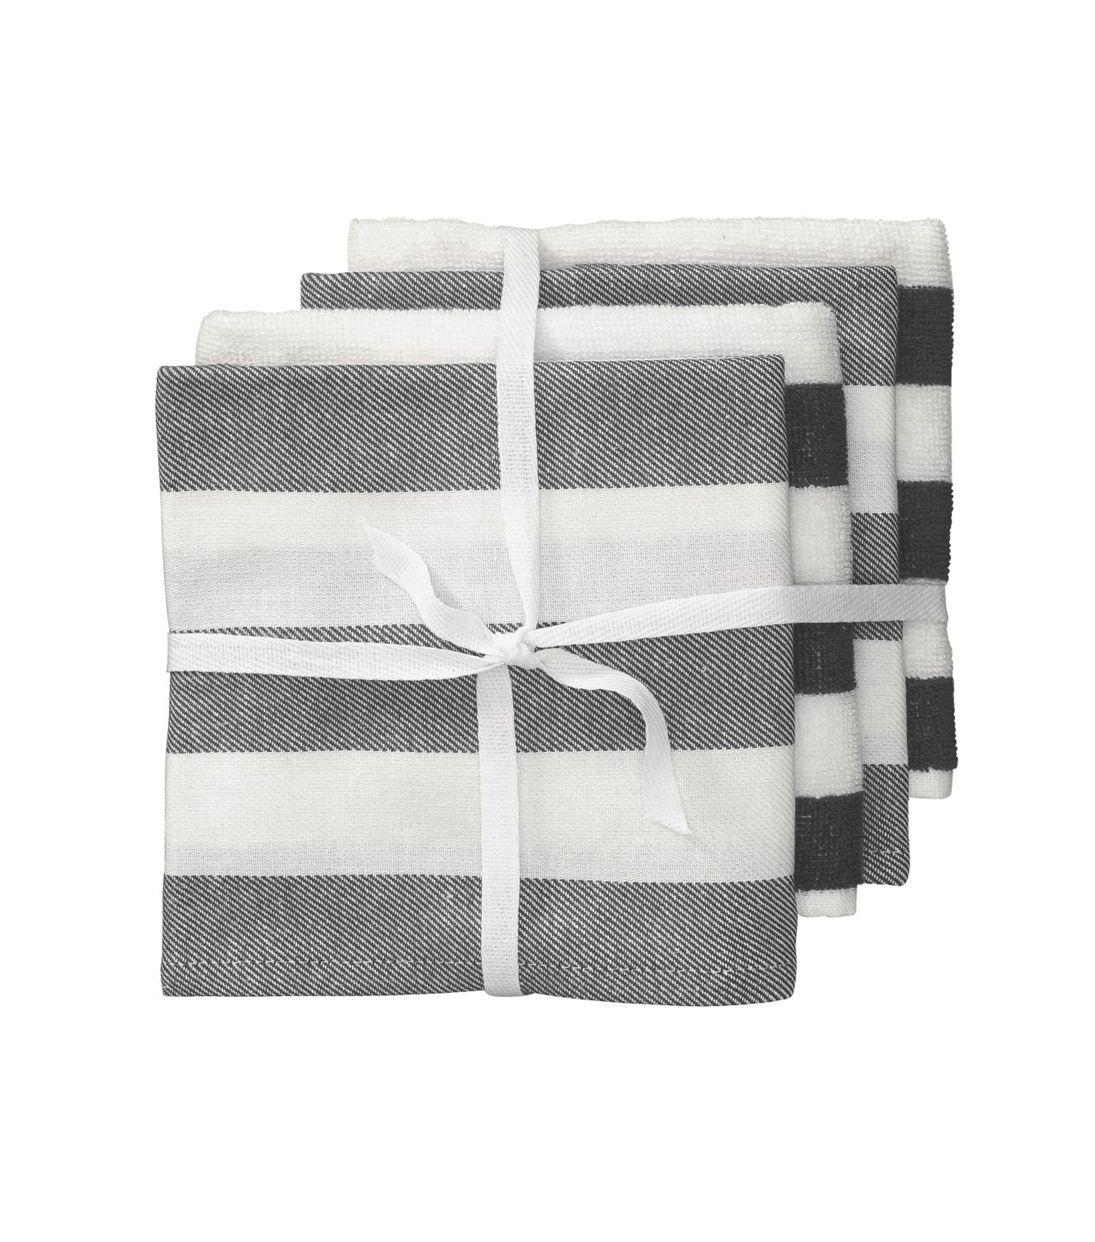 4 pak thee en keukendoeken tea towel pinterest towels rh pinterest com